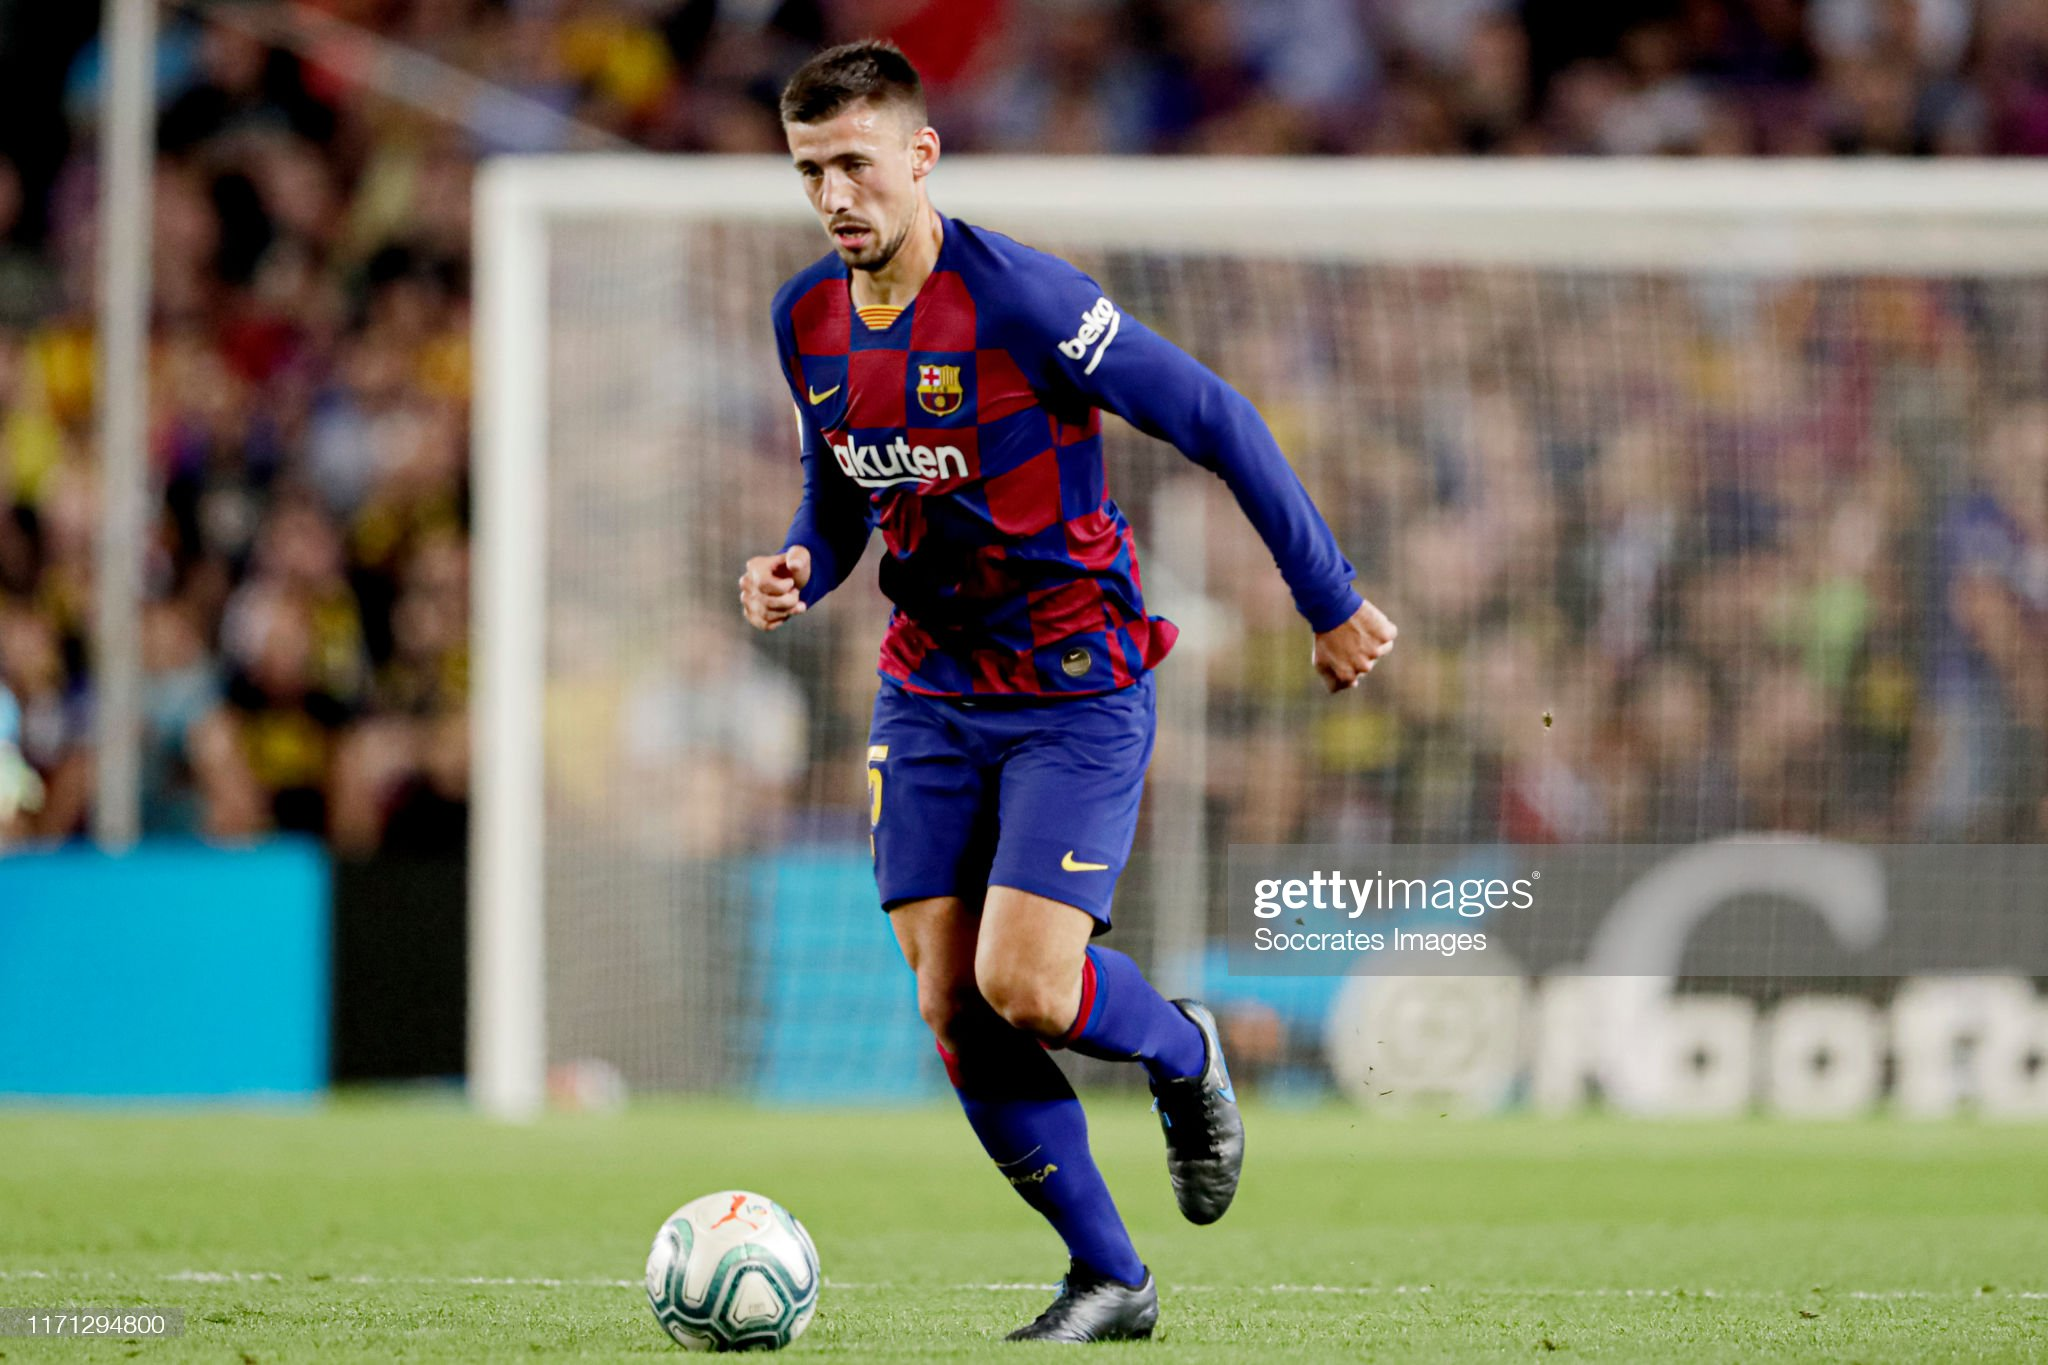 صور مباراة : برشلونة - فياريال 2-1 ( 24-09-2019 )  Clement-lenglet-of-fc-barcelona-during-the-la-liga-santander-match-picture-id1171294800?s=2048x2048